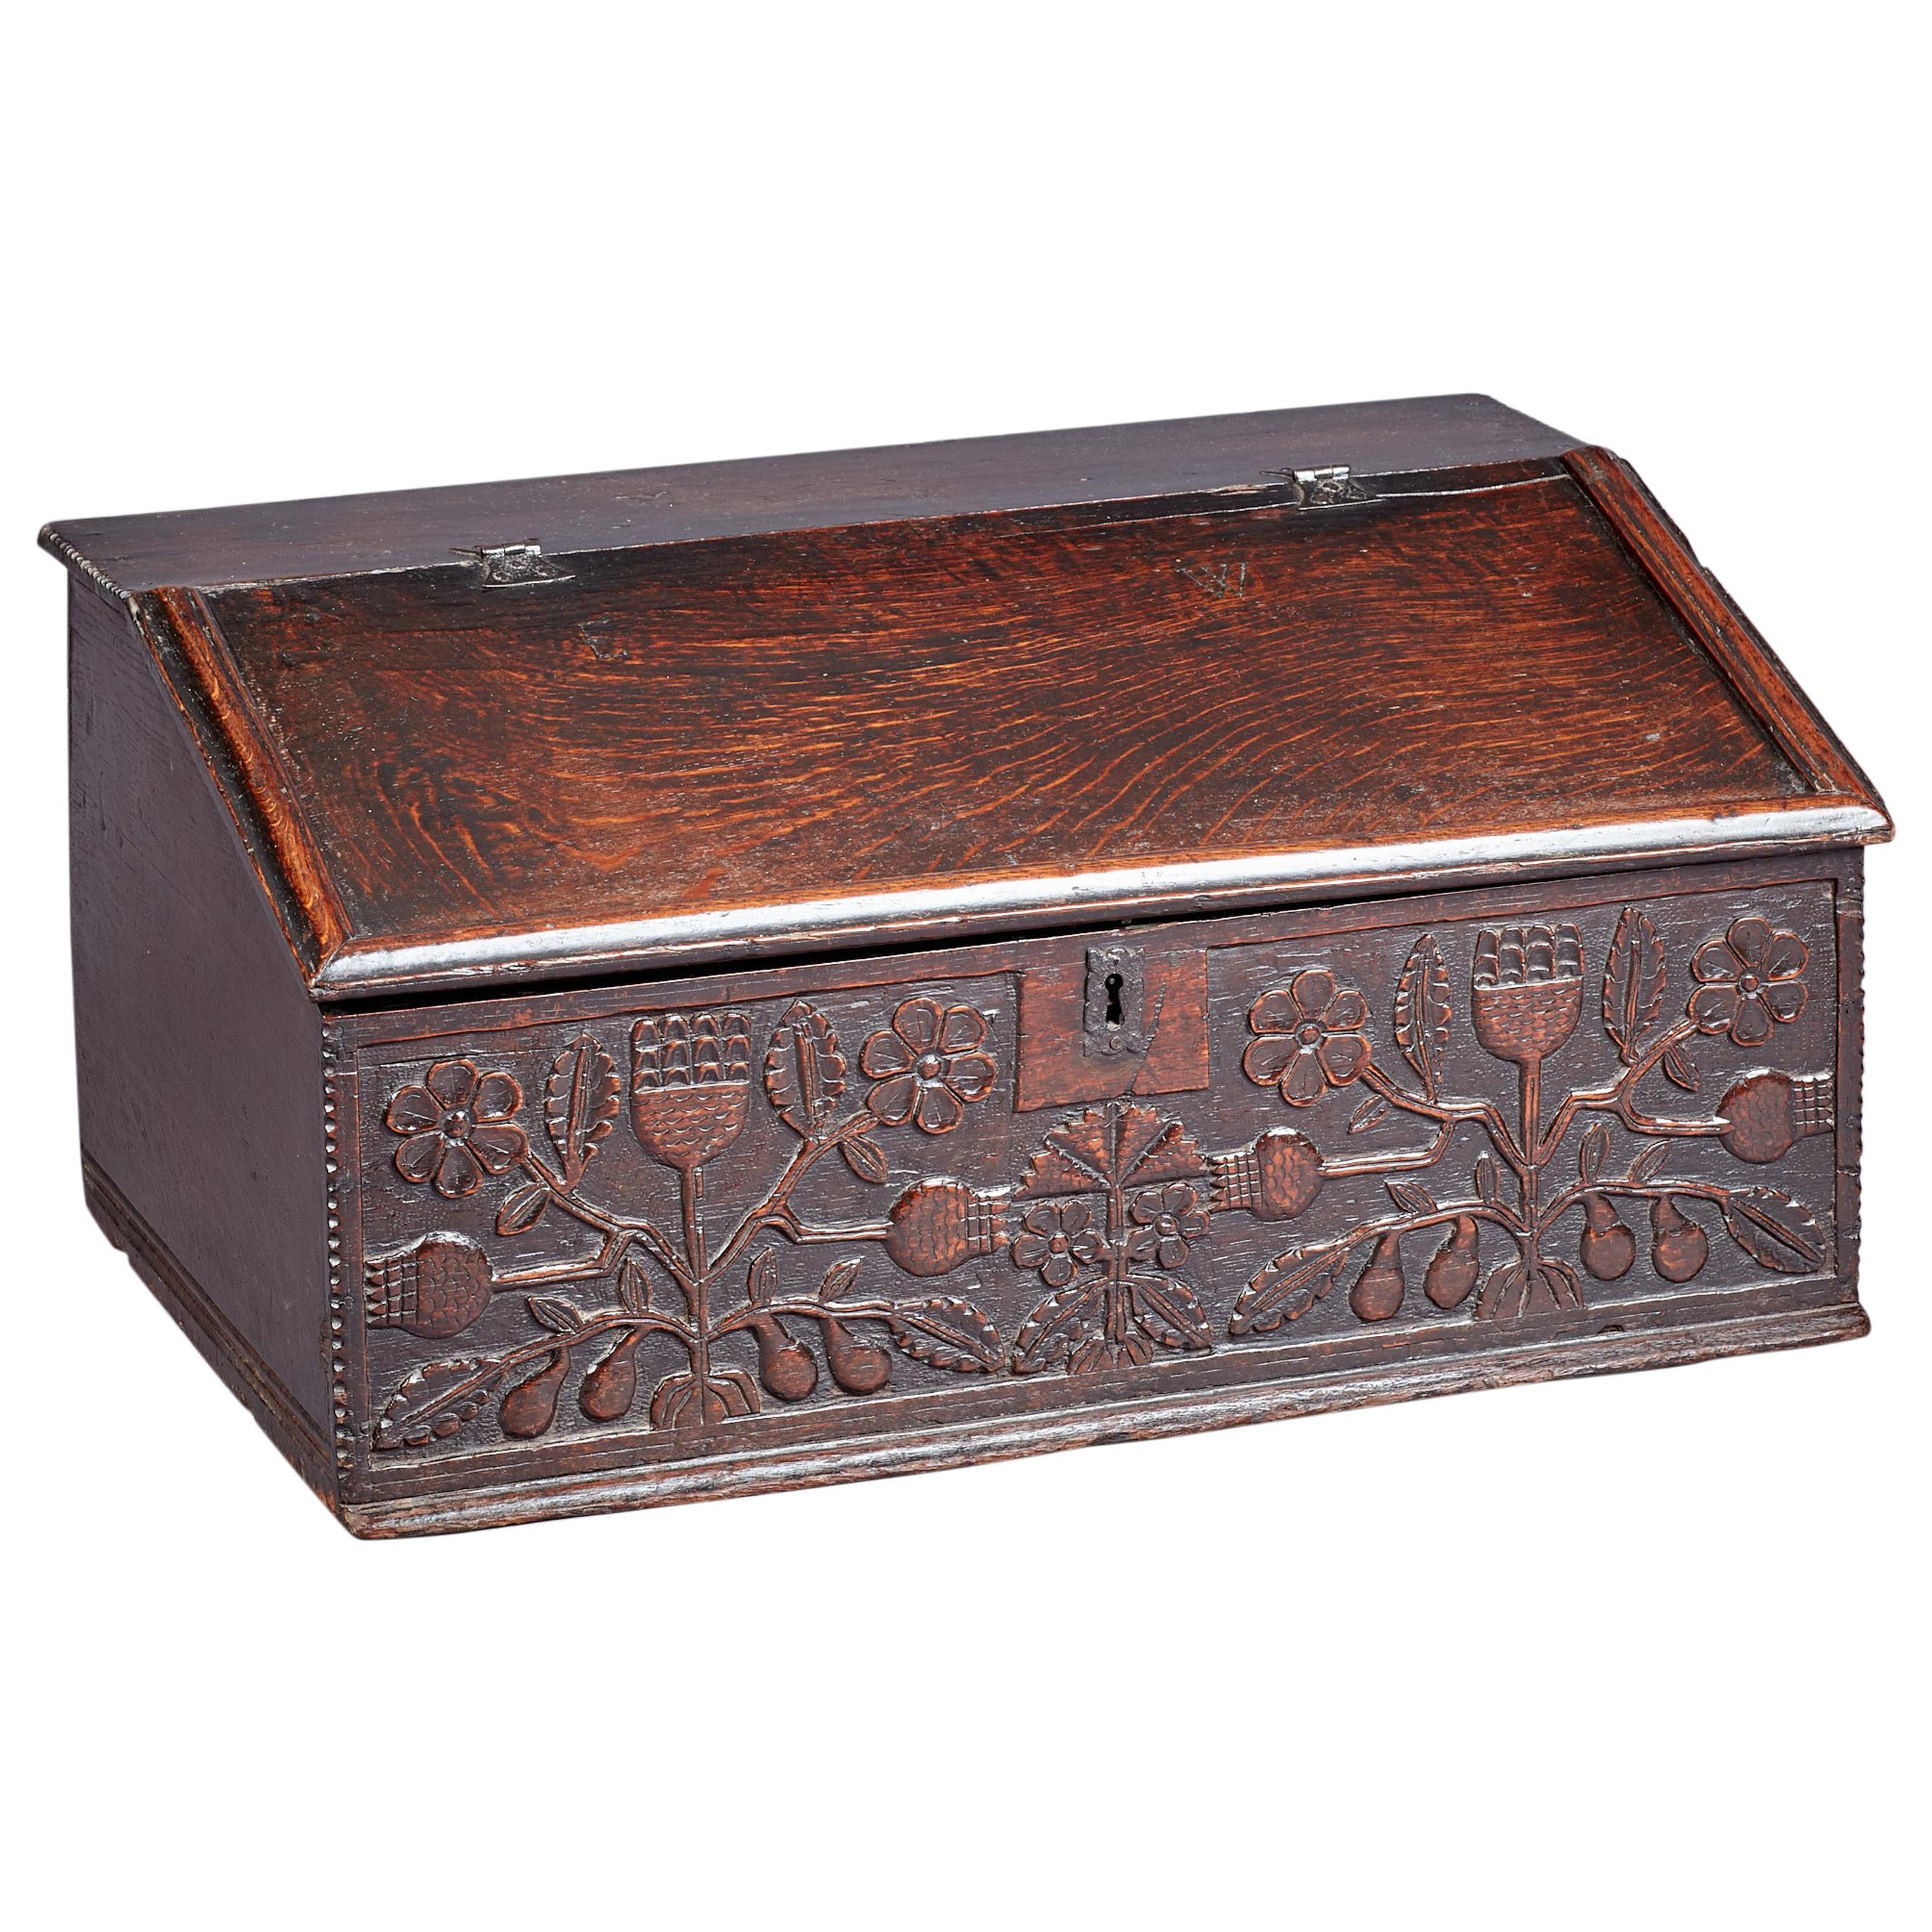 Oak Desk Box, Charles II period, Lancashire, circa 1660-1670